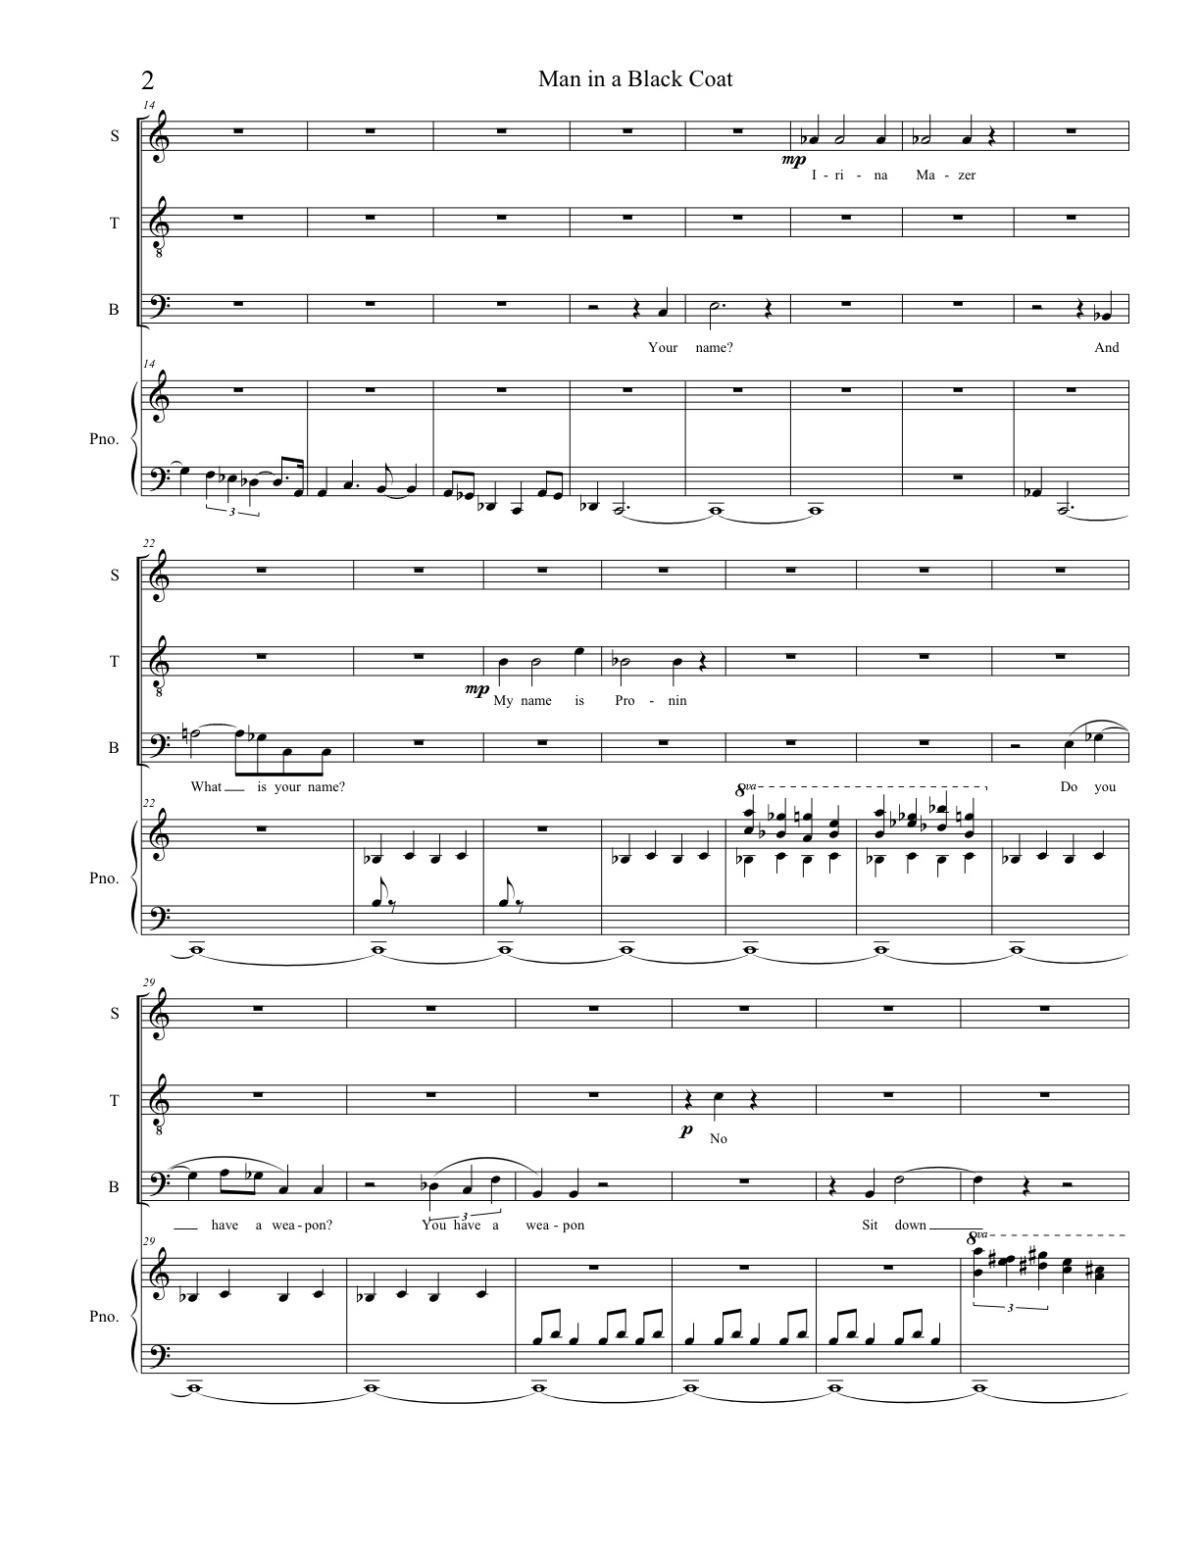 NEW VOICES - a concert featuring three living composers: Edward Ficklin, Kim D. Sherman, & Inessa ZaretskyThe Kosciusczko FoundationApril 2009Production credits